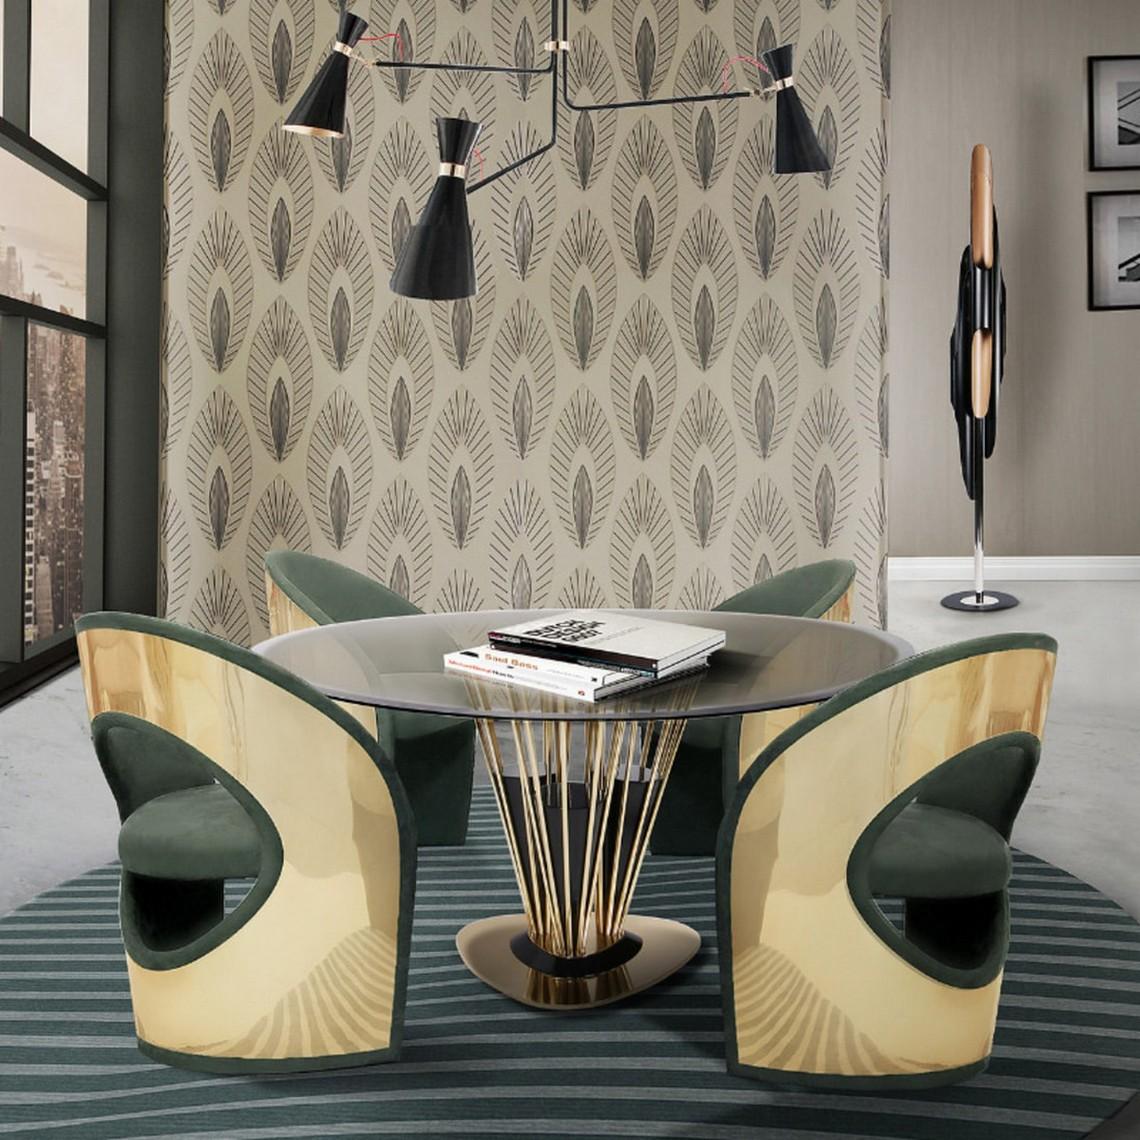 Top Velvet Dining Chairs velvet dining chairs Top Velvet Dining Chairs jones